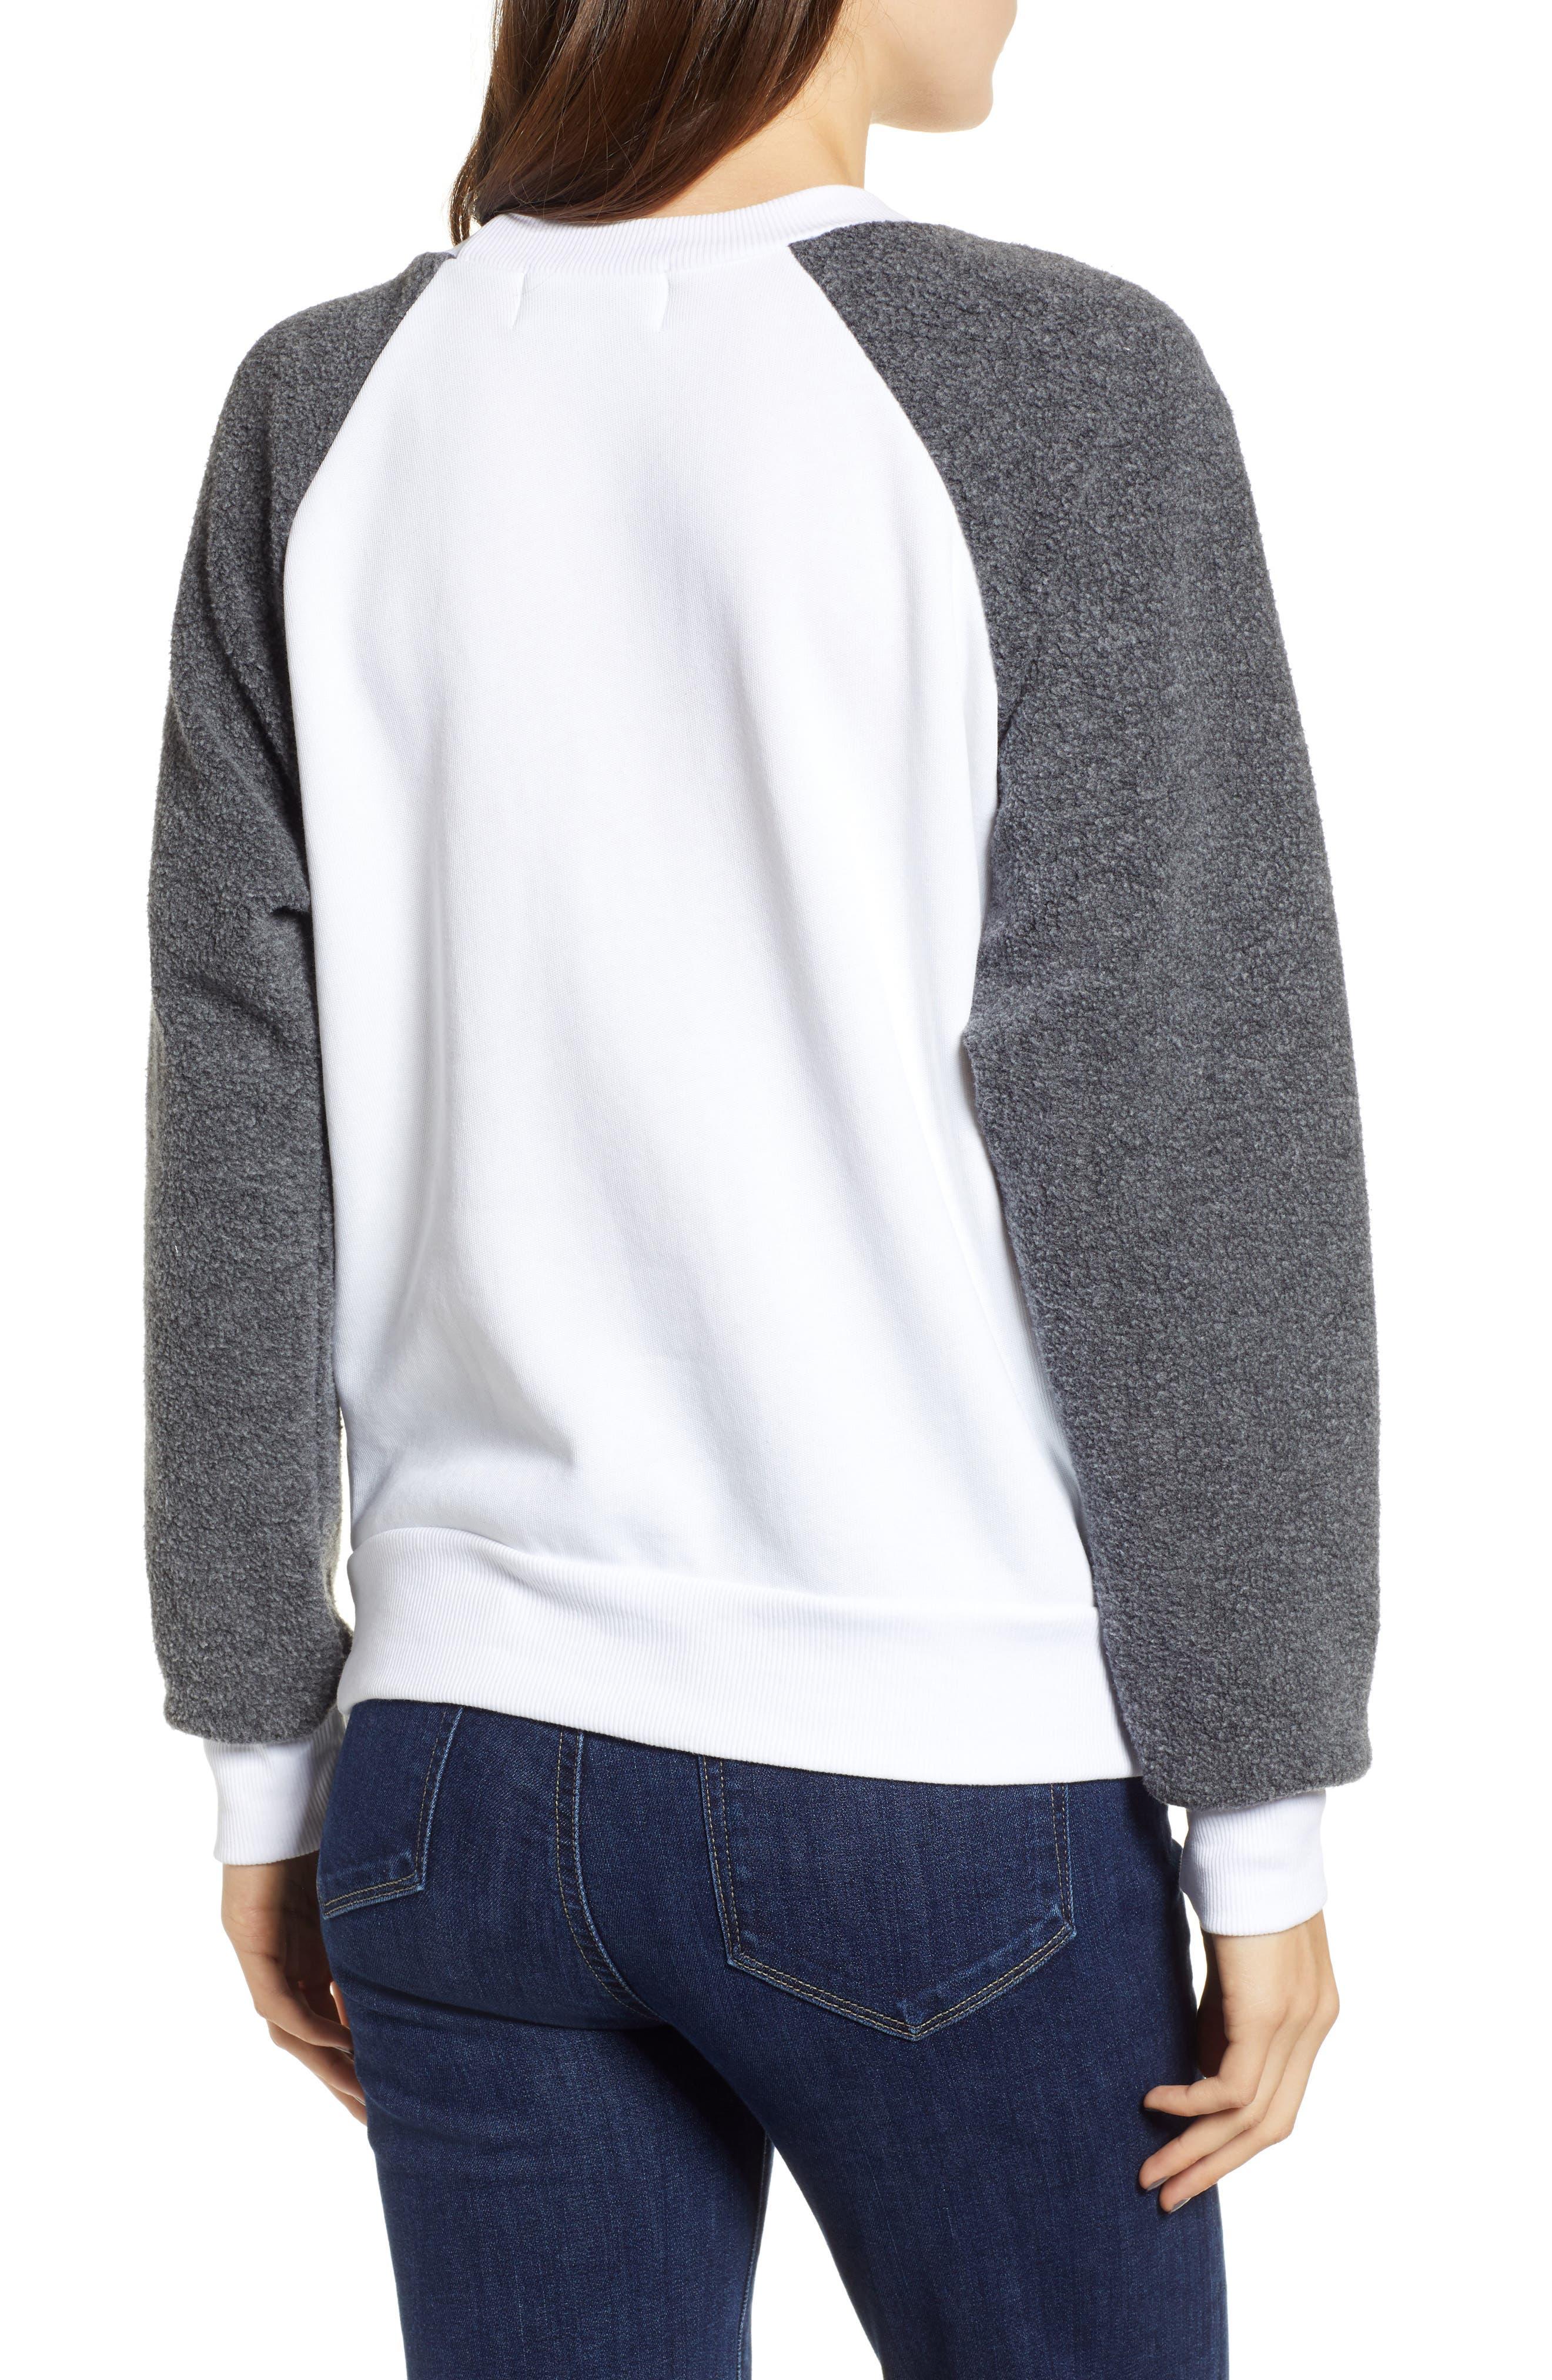 Fatale Fleece Sleeve Sweatshirt,                             Alternate thumbnail 2, color,                             CLEAN WHITE/ CLEAN BLACK